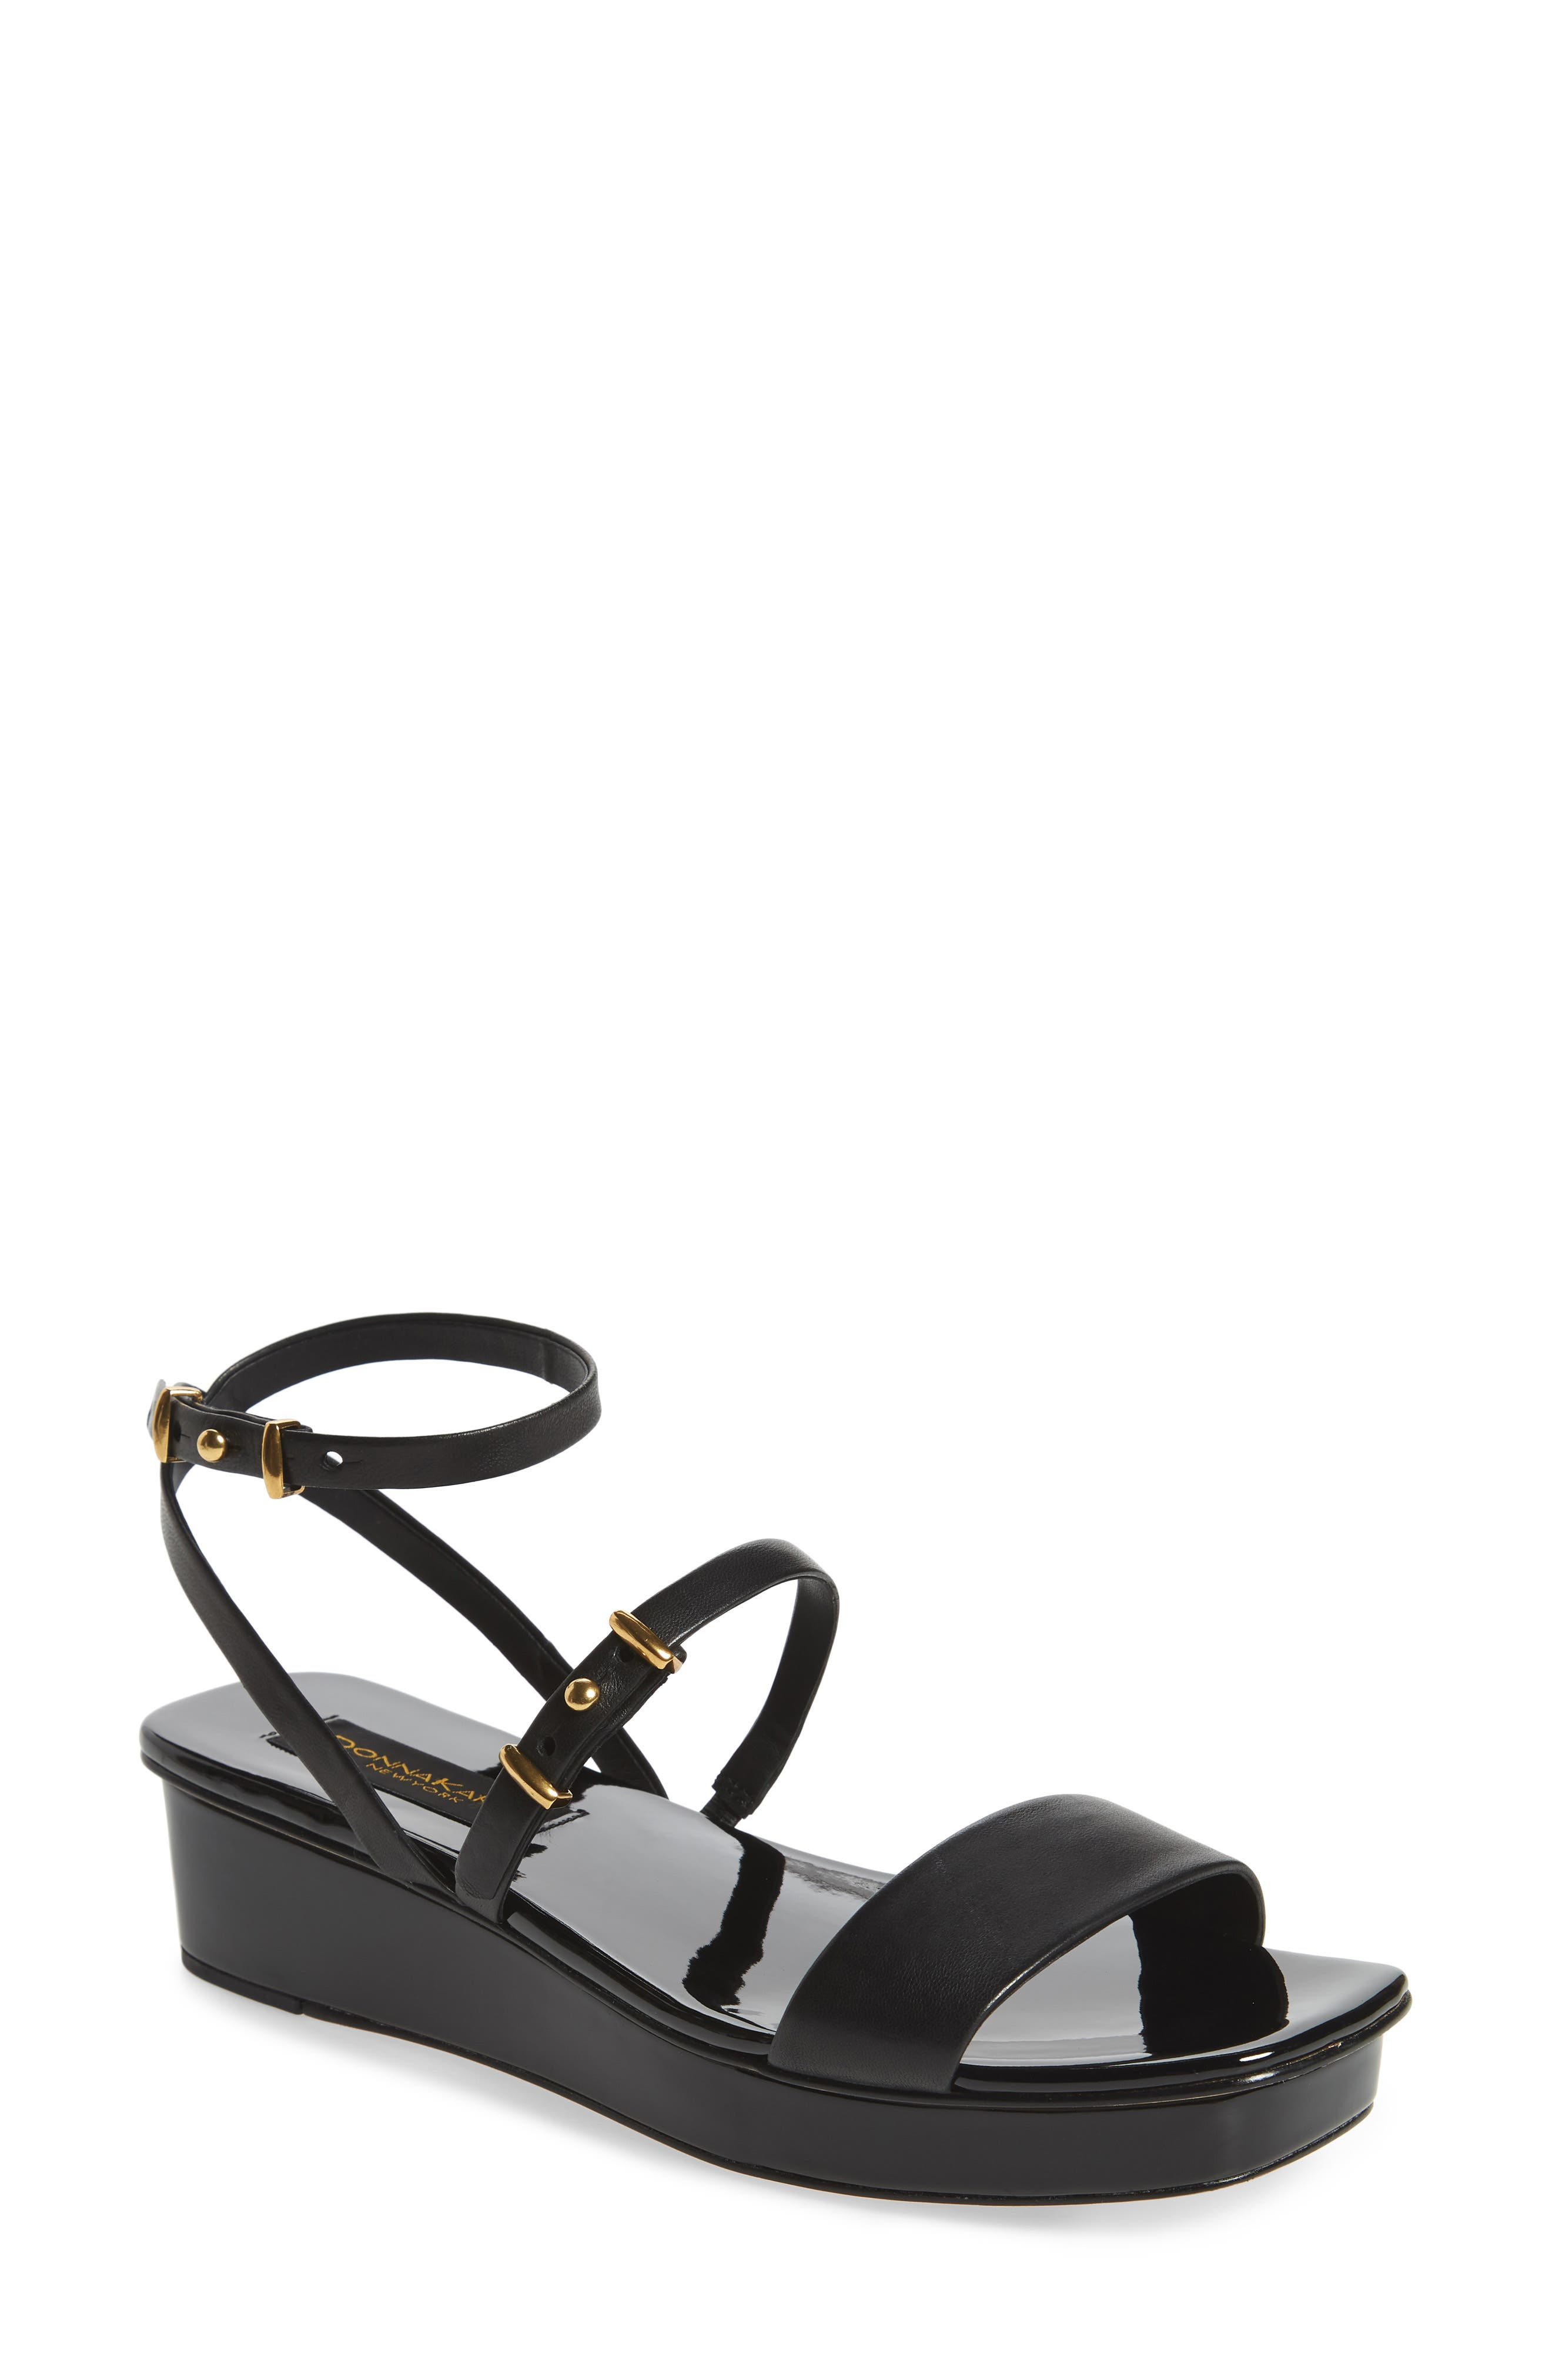 Donna Karan New York Ankle Strap Wedge Sandal (Women)